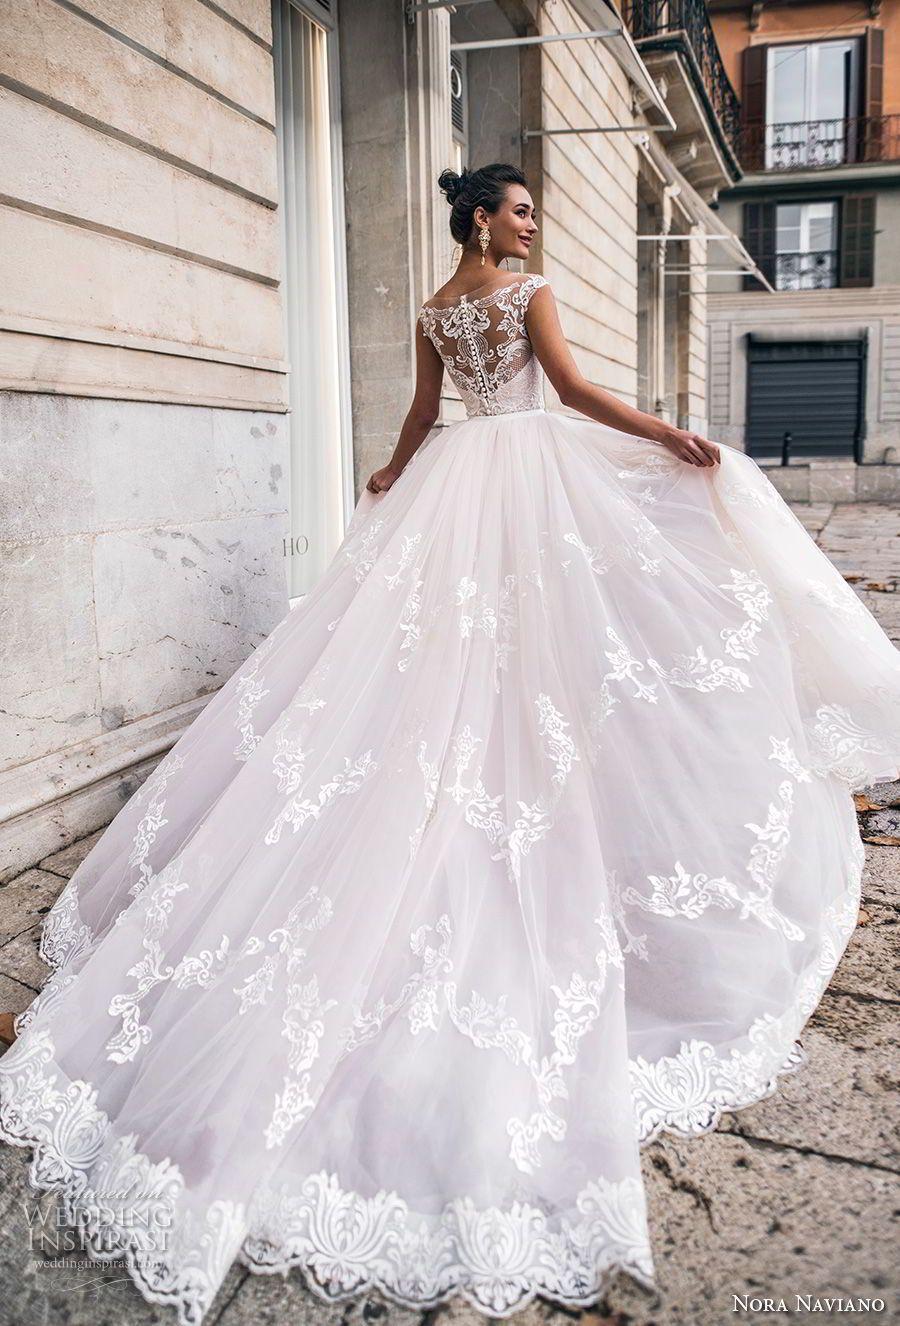 Nora naviano wedding dresses u ucvoyageud bridal collection in